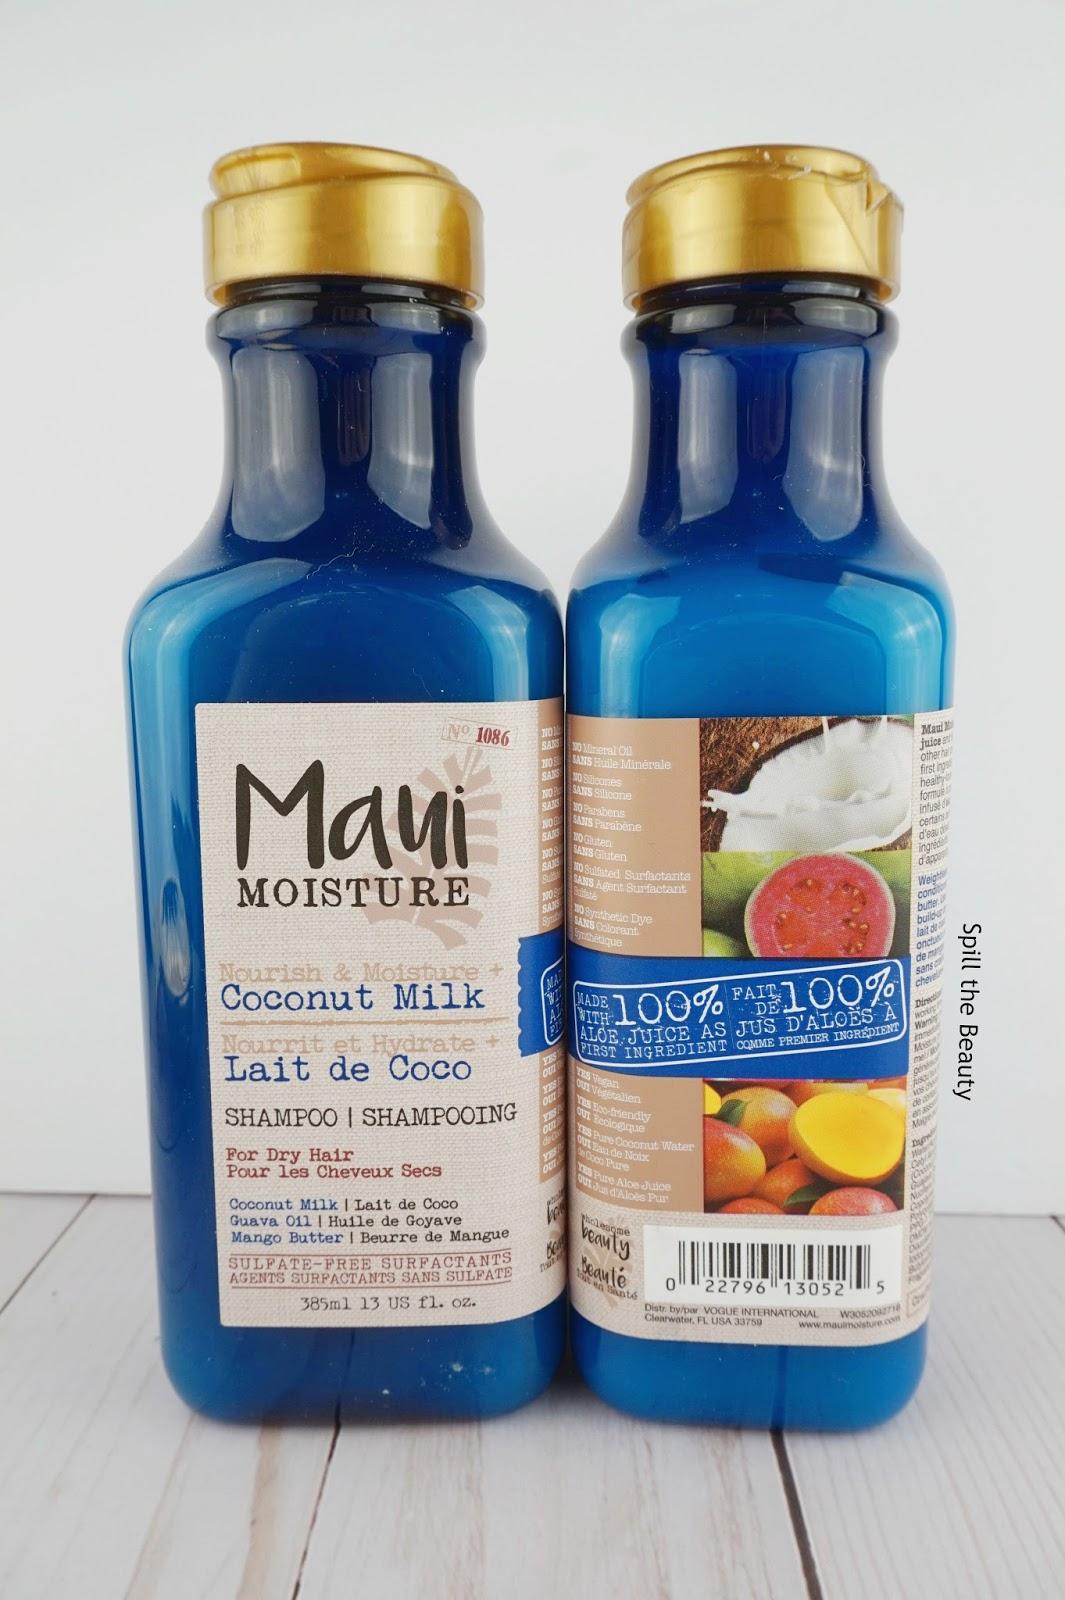 maui moisture coconut milk collection